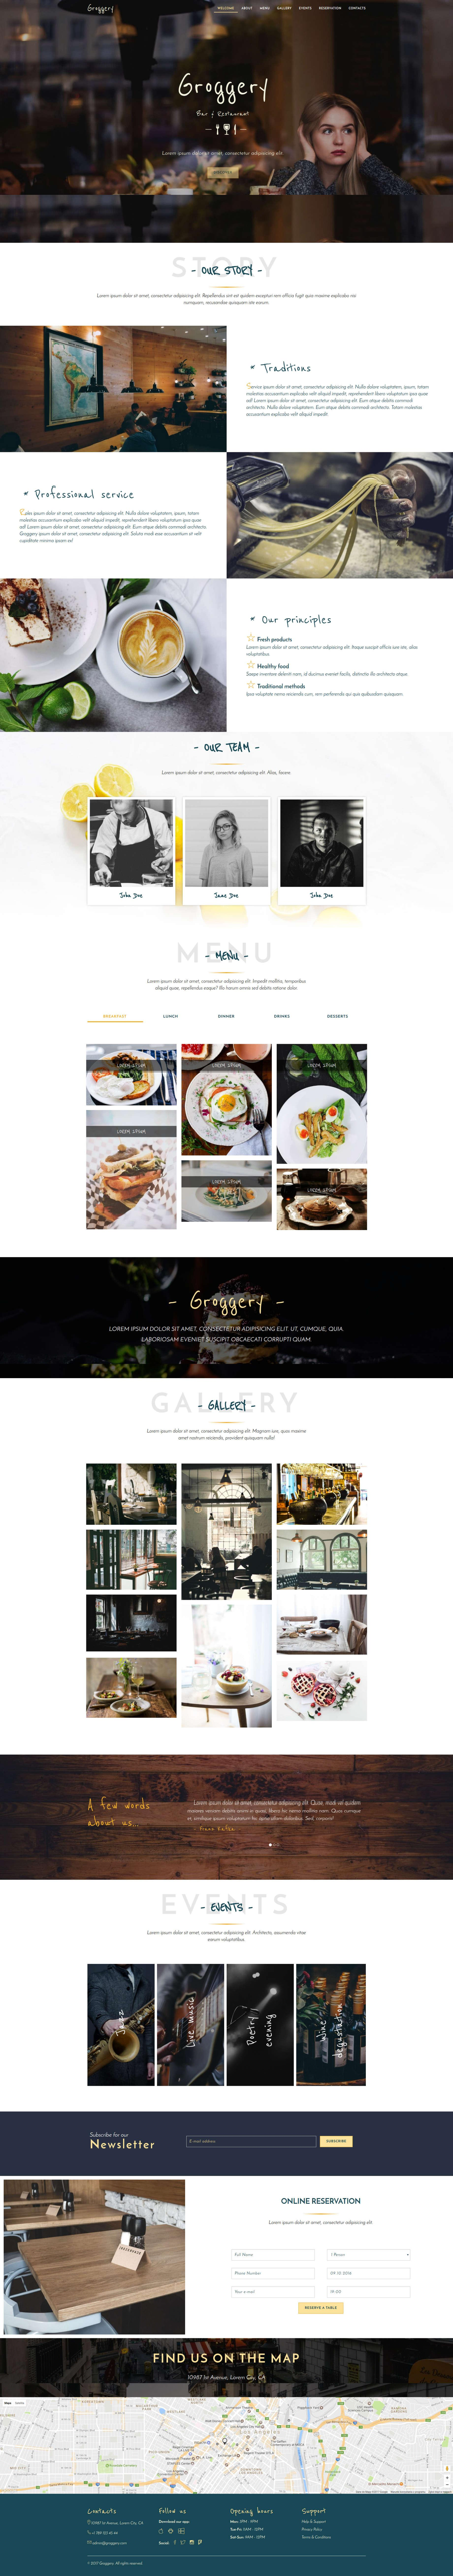 Bar/Restauracja Groggery RWD